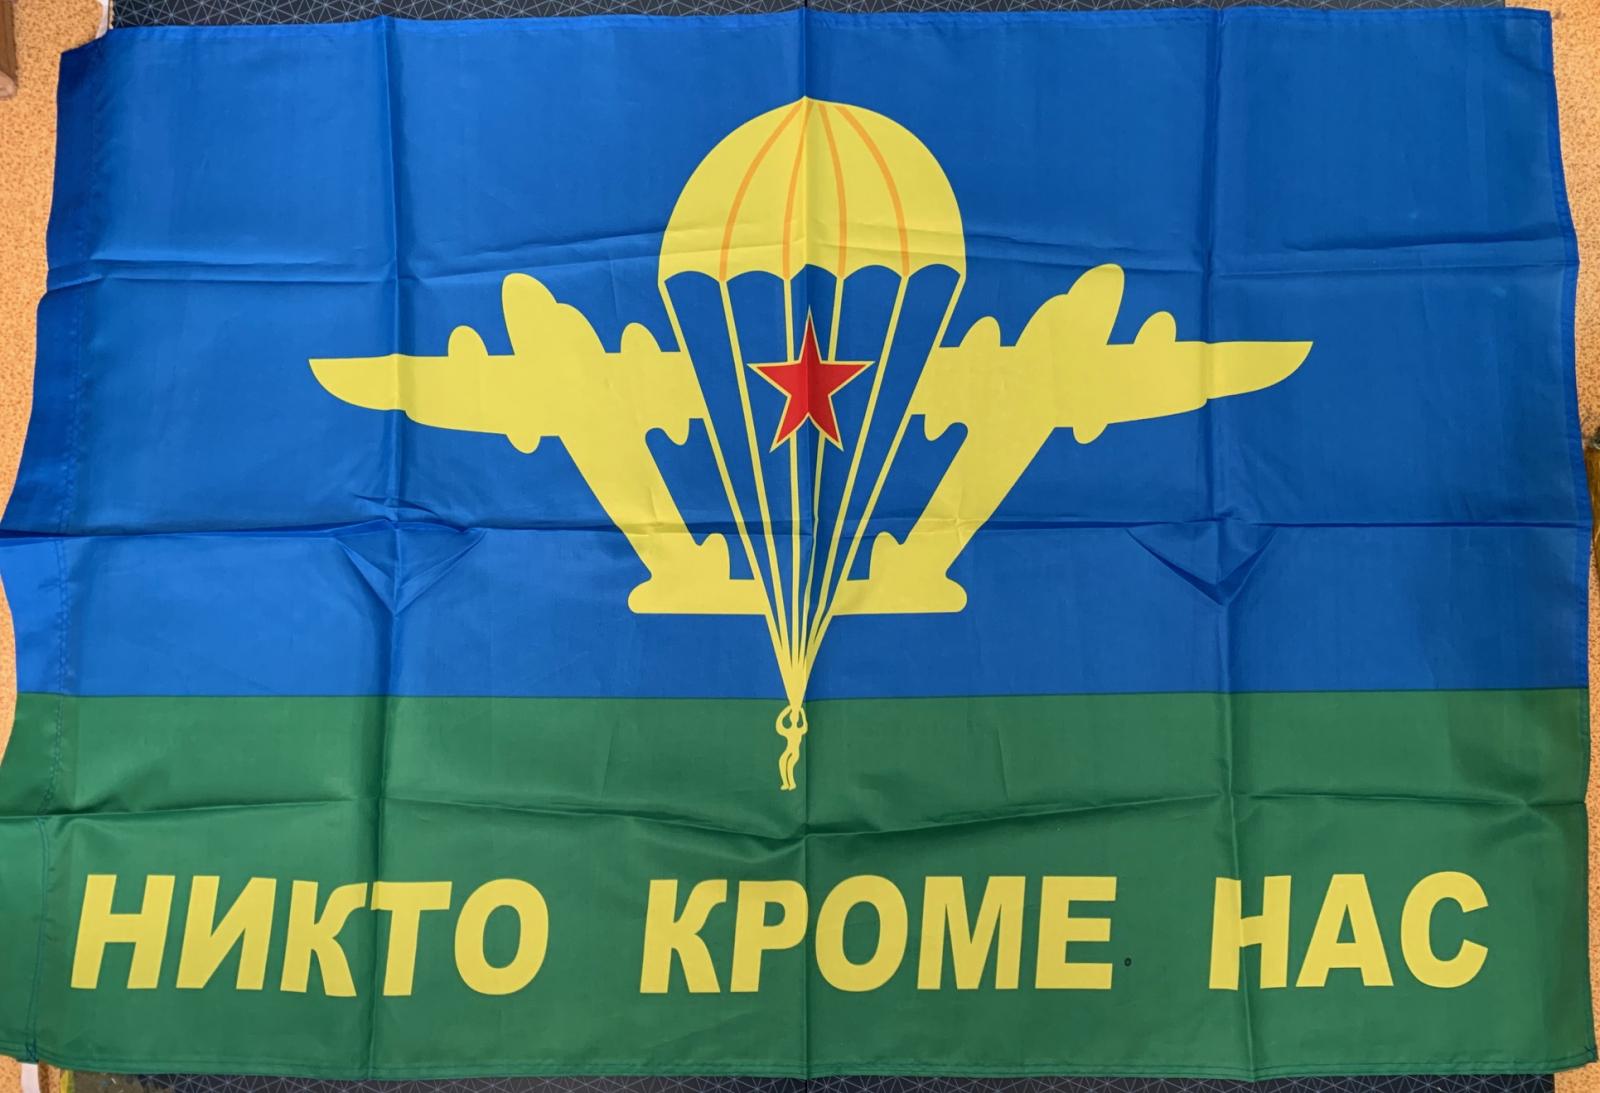 Флаг ВДВ Никто кроме нас желтый купол